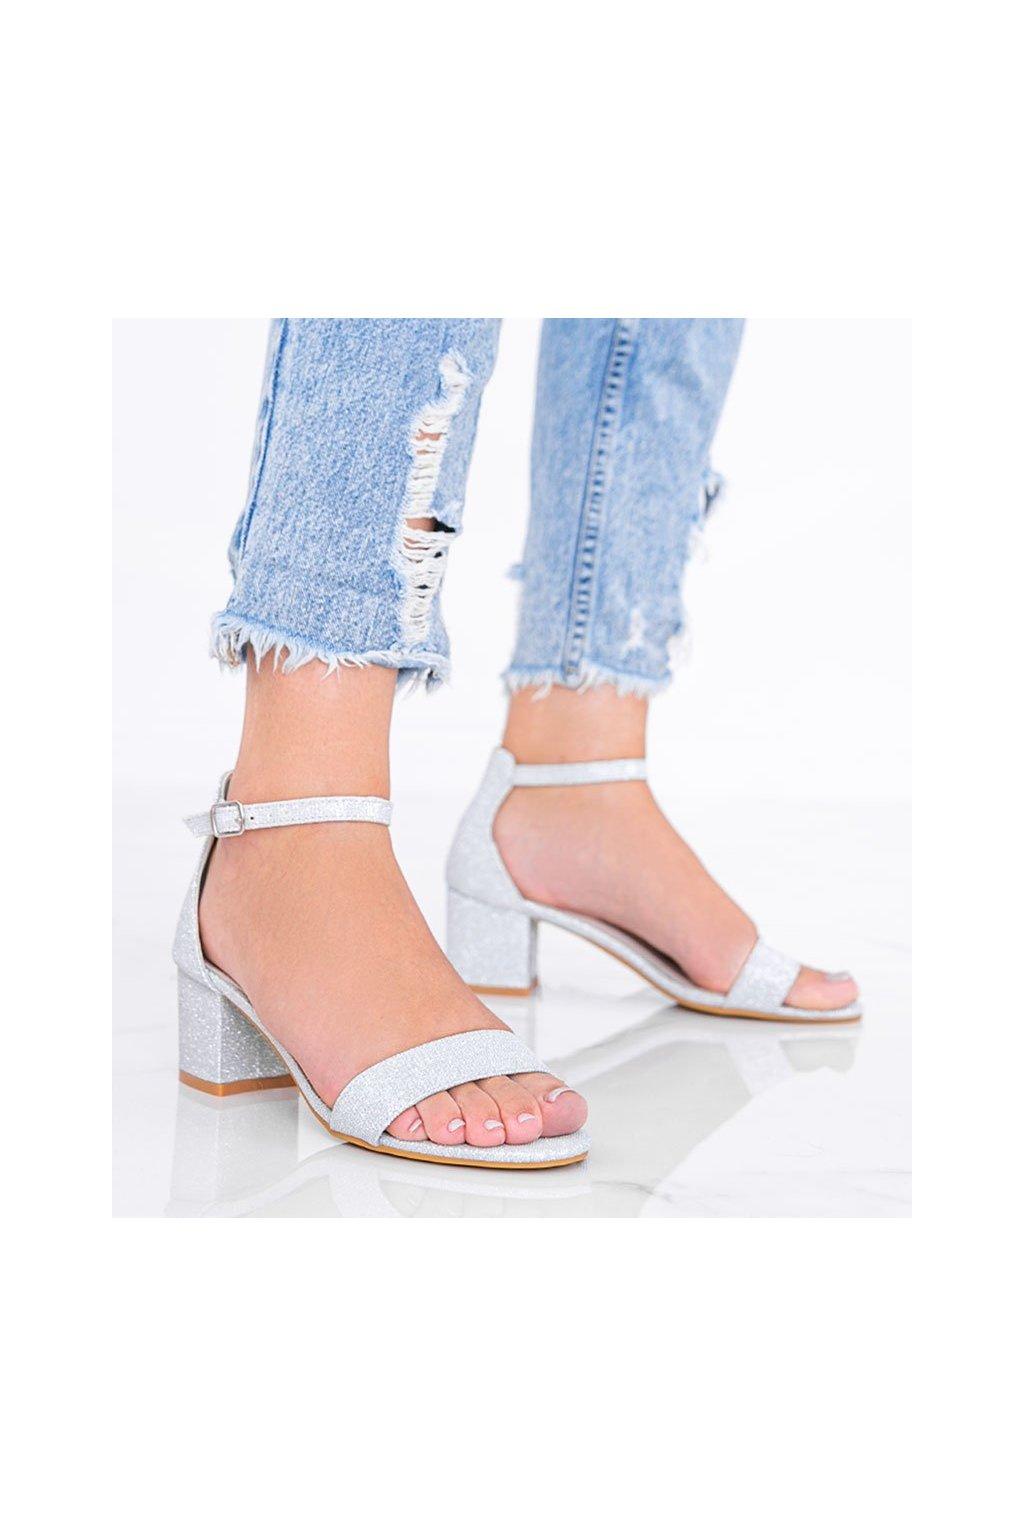 Dámske topánky sandále sivé kód LEI360-A - GM